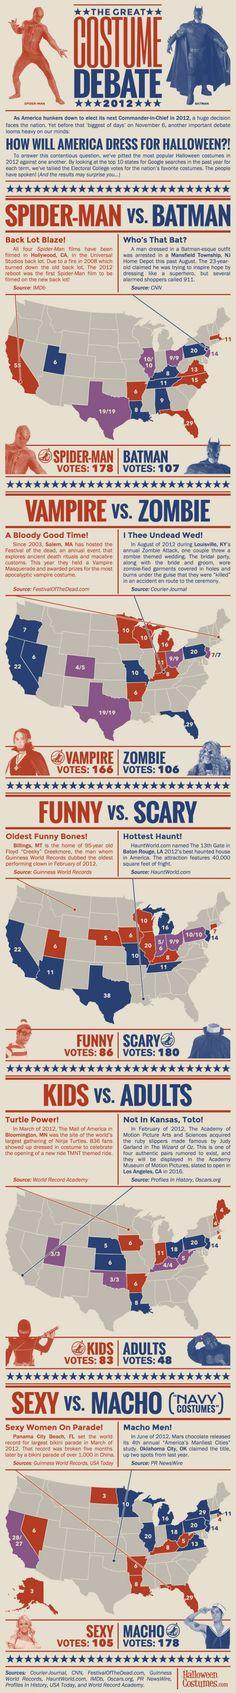 The Great Costume Debate 2012